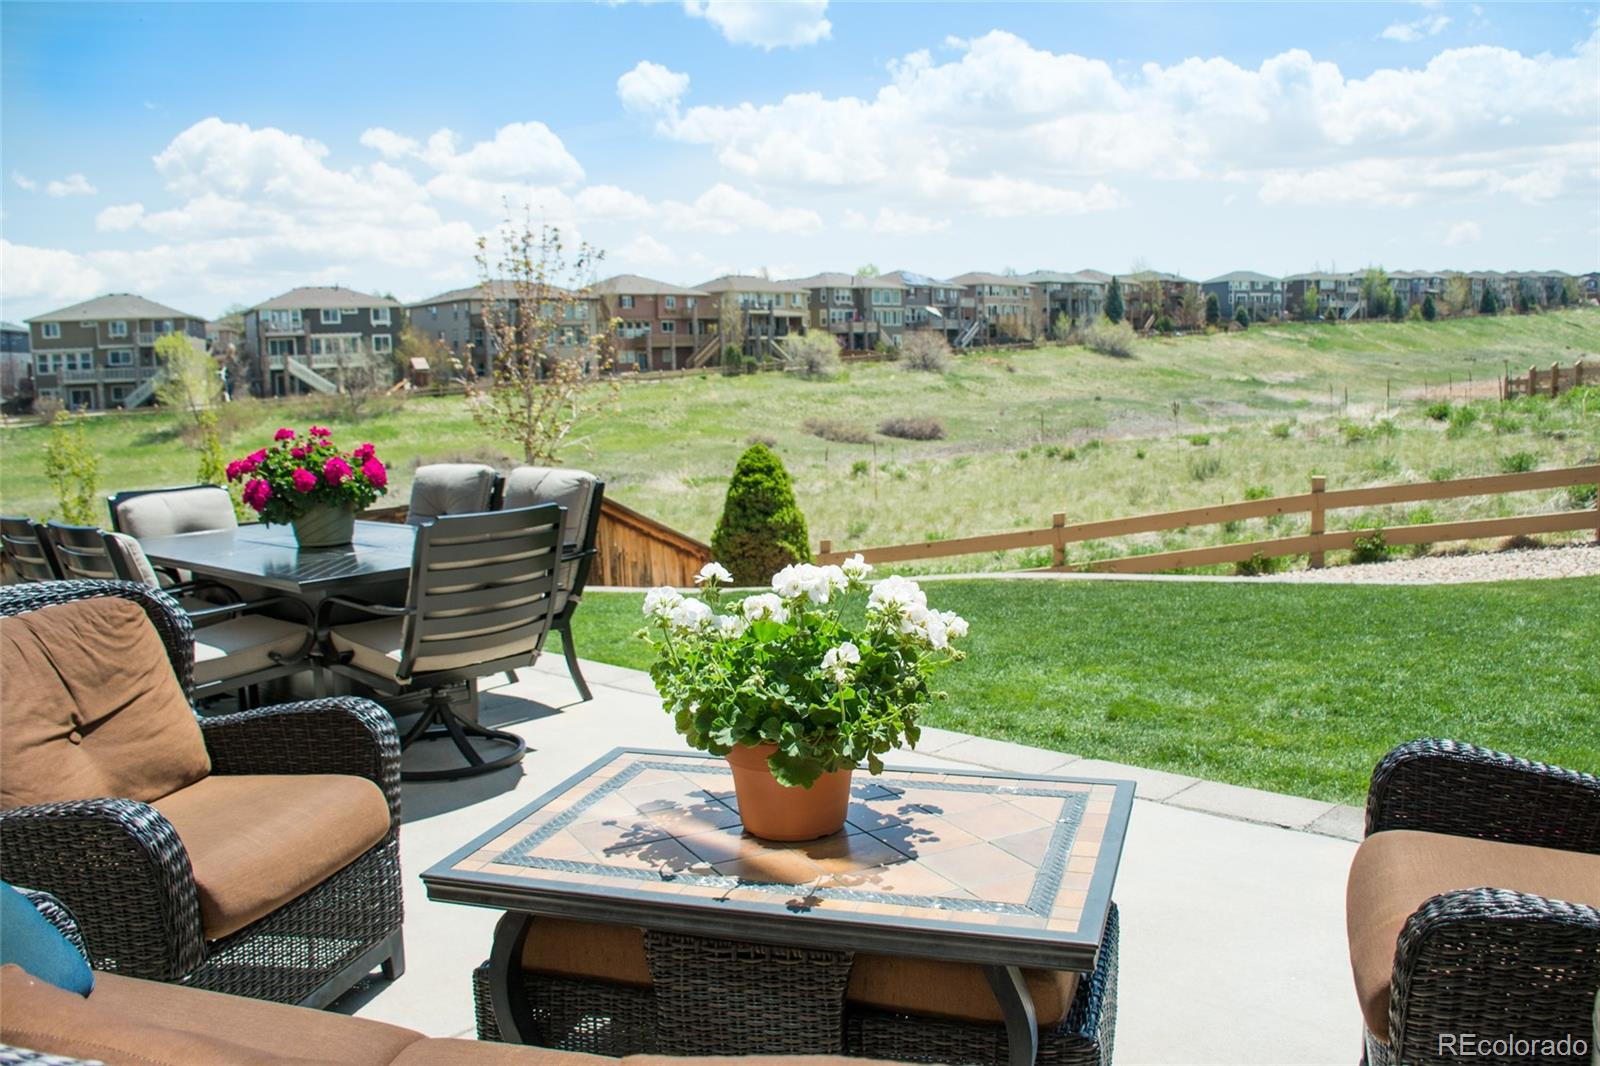 MLS# 6747511 - 1 - 4568 Valleybrook Drive, Highlands Ranch, CO 80130